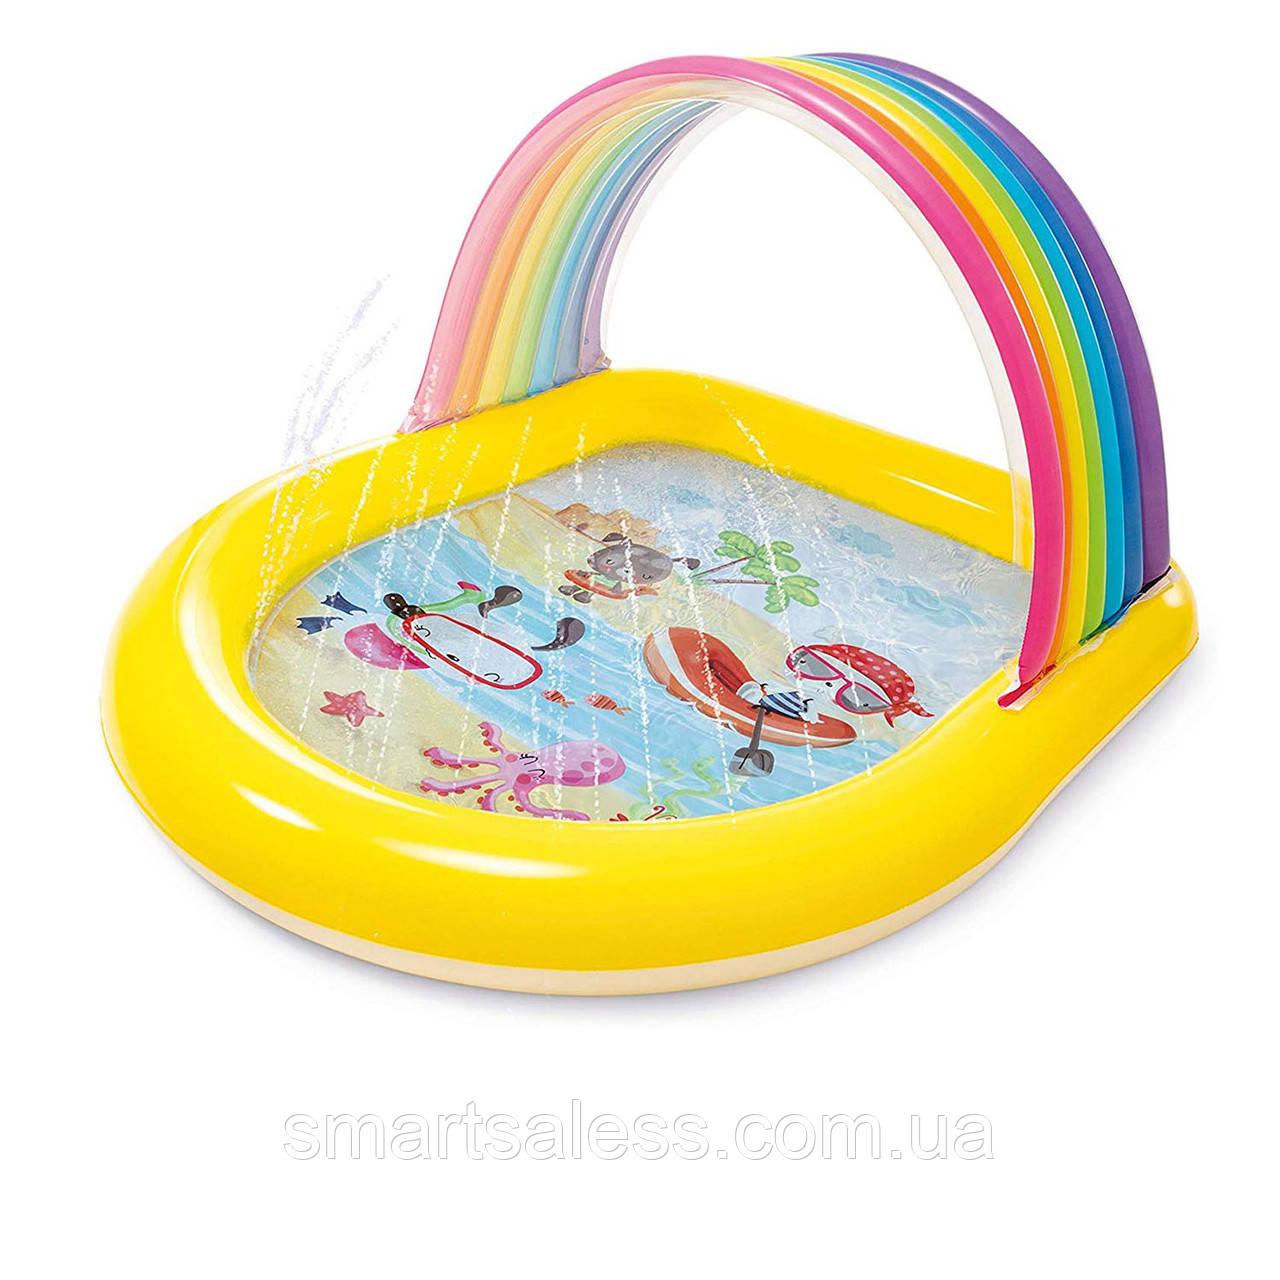 Дитячий надувний басейн Intex 57156 «Веселка», 147 х 130 х 86 см